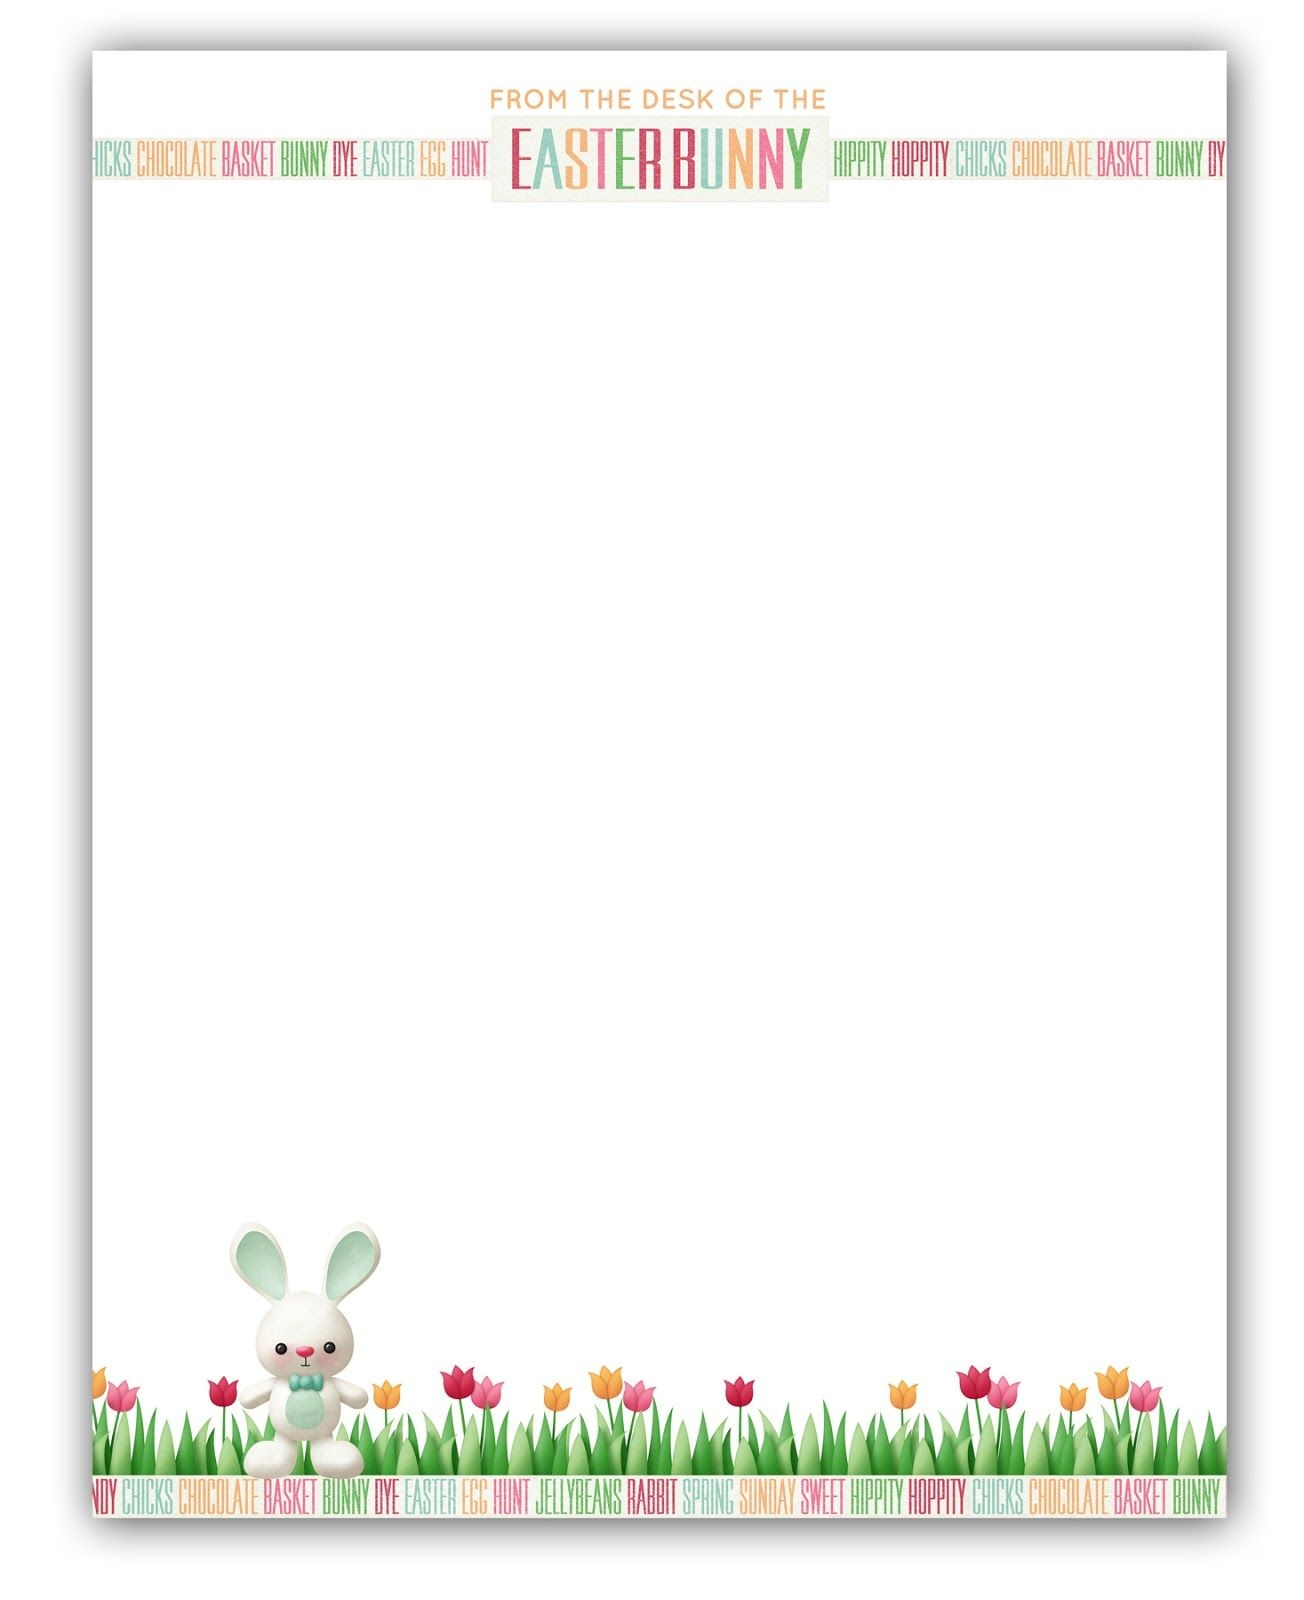 Easter Bunny Stationary | Free Printable | Printable Freebies! In - Free Printable Spring Stationery